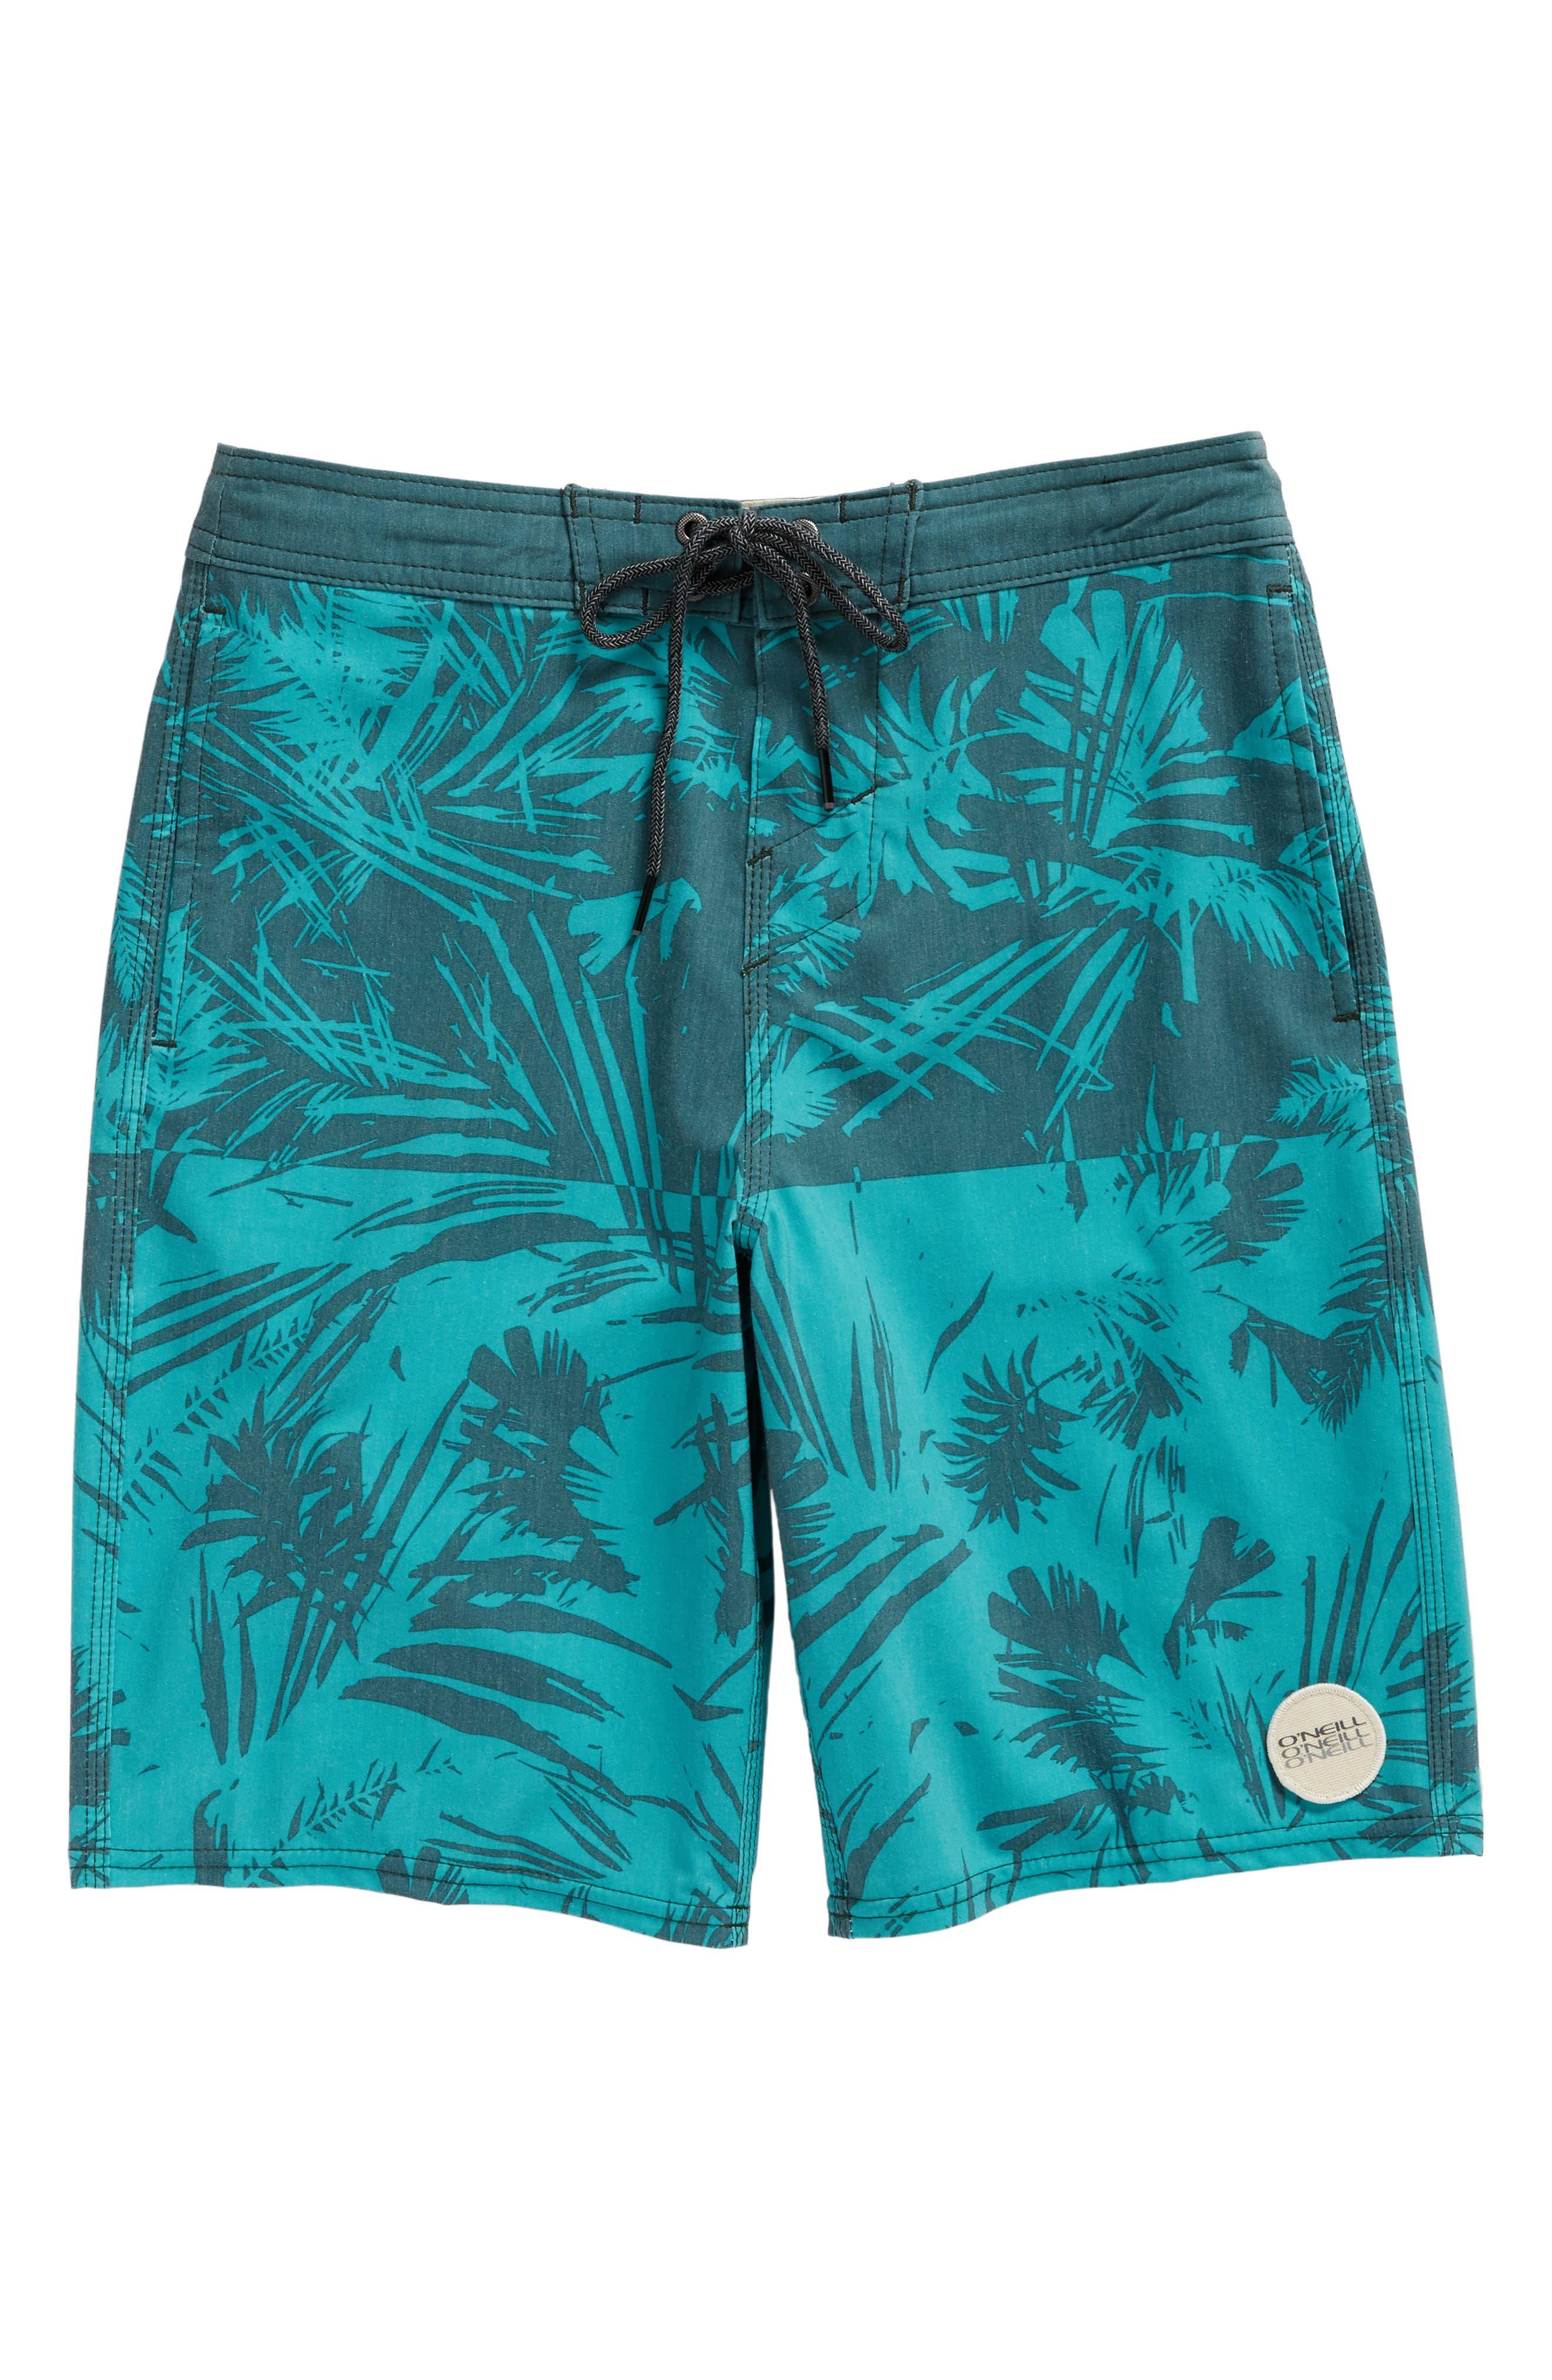 Inverted Cruzer Board Shorts,                             Alternate thumbnail 3, color,                             Aqua